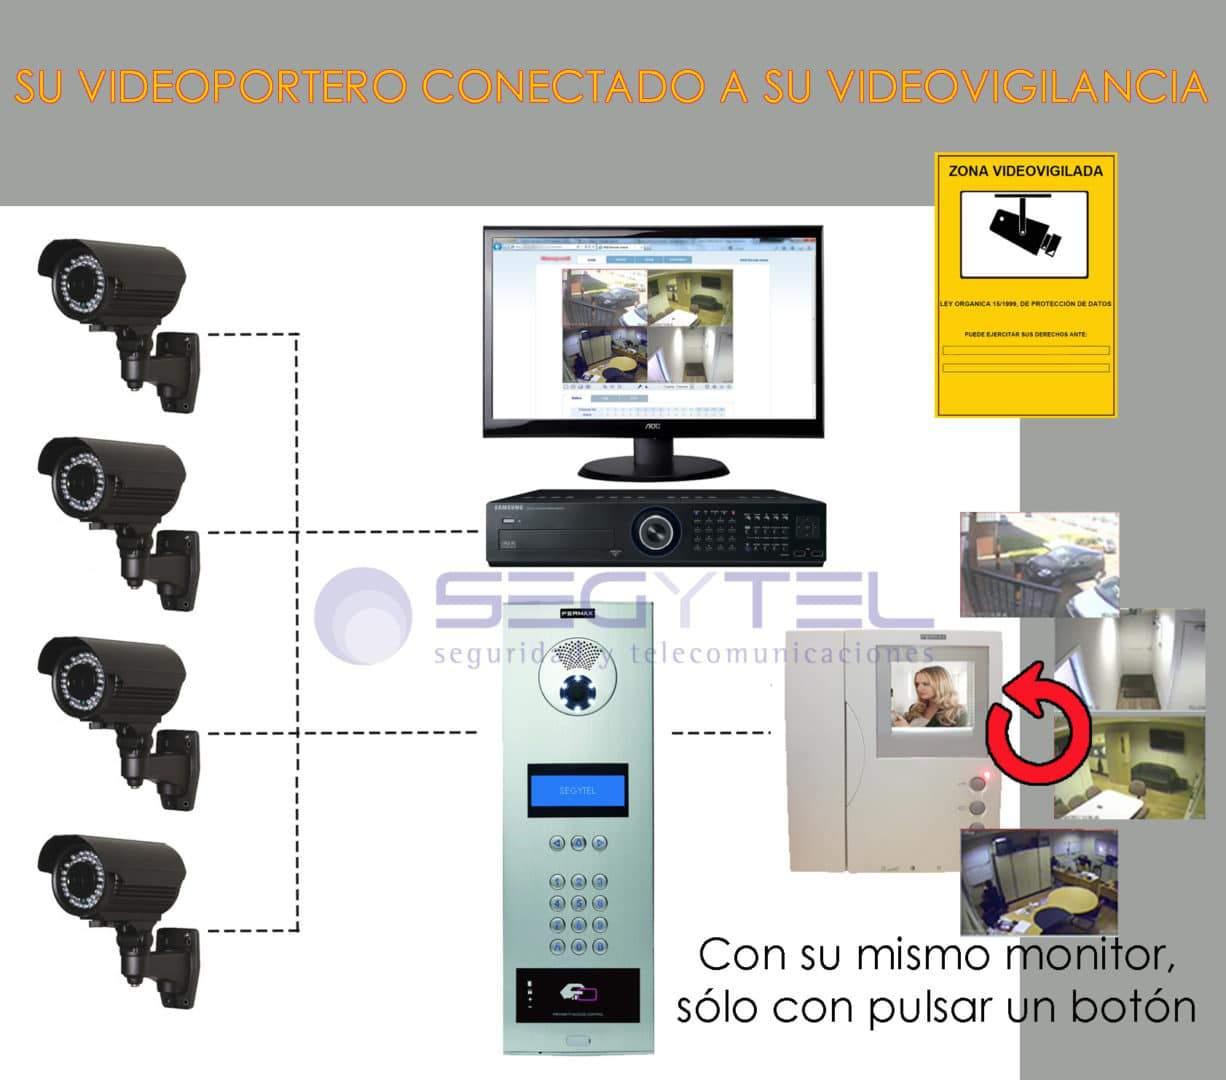 Videoportero conectado a Videovigilancia